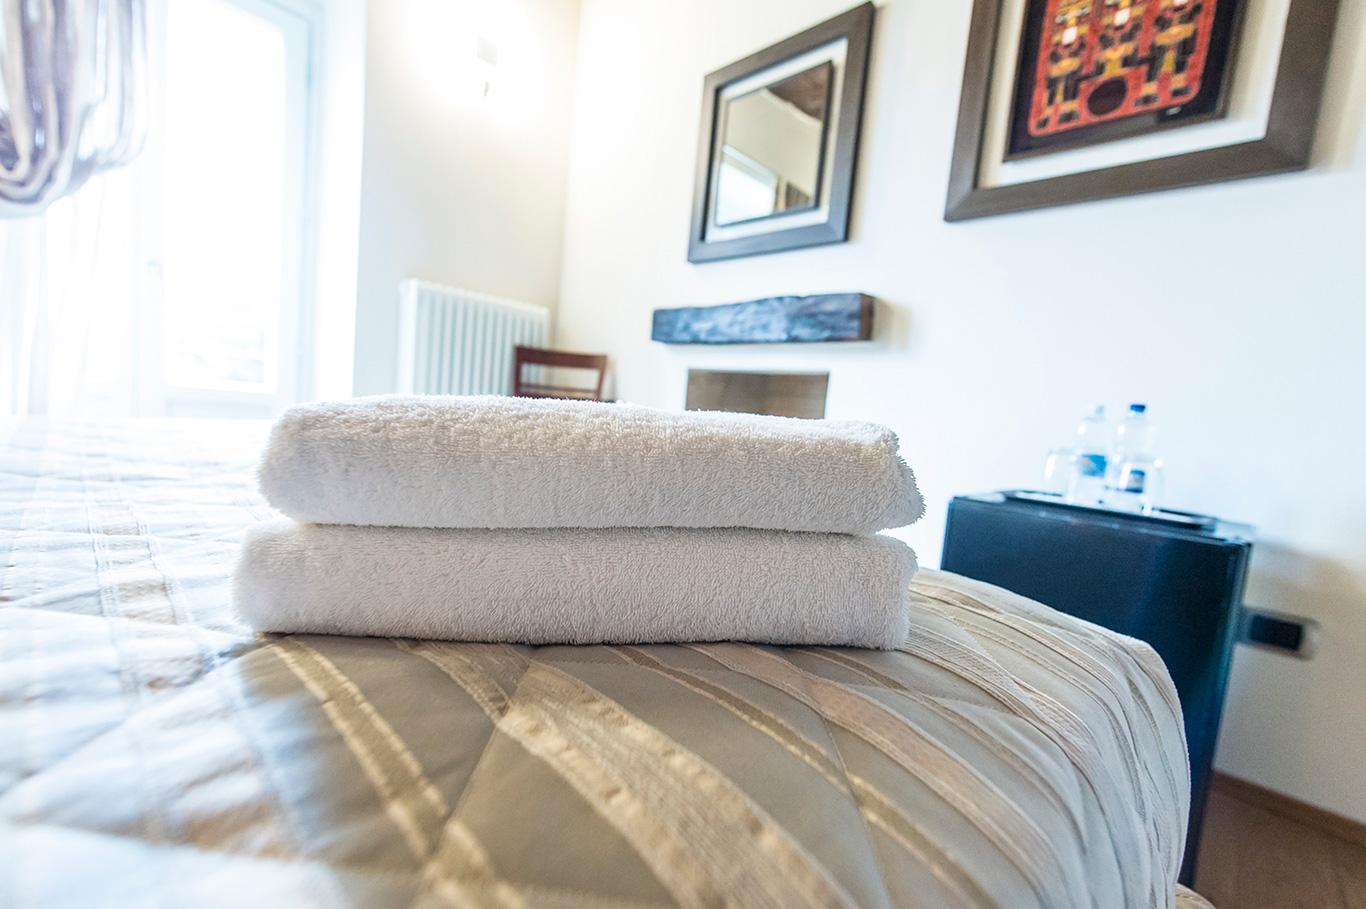 ausonne-stanza-asciugamano-bianco